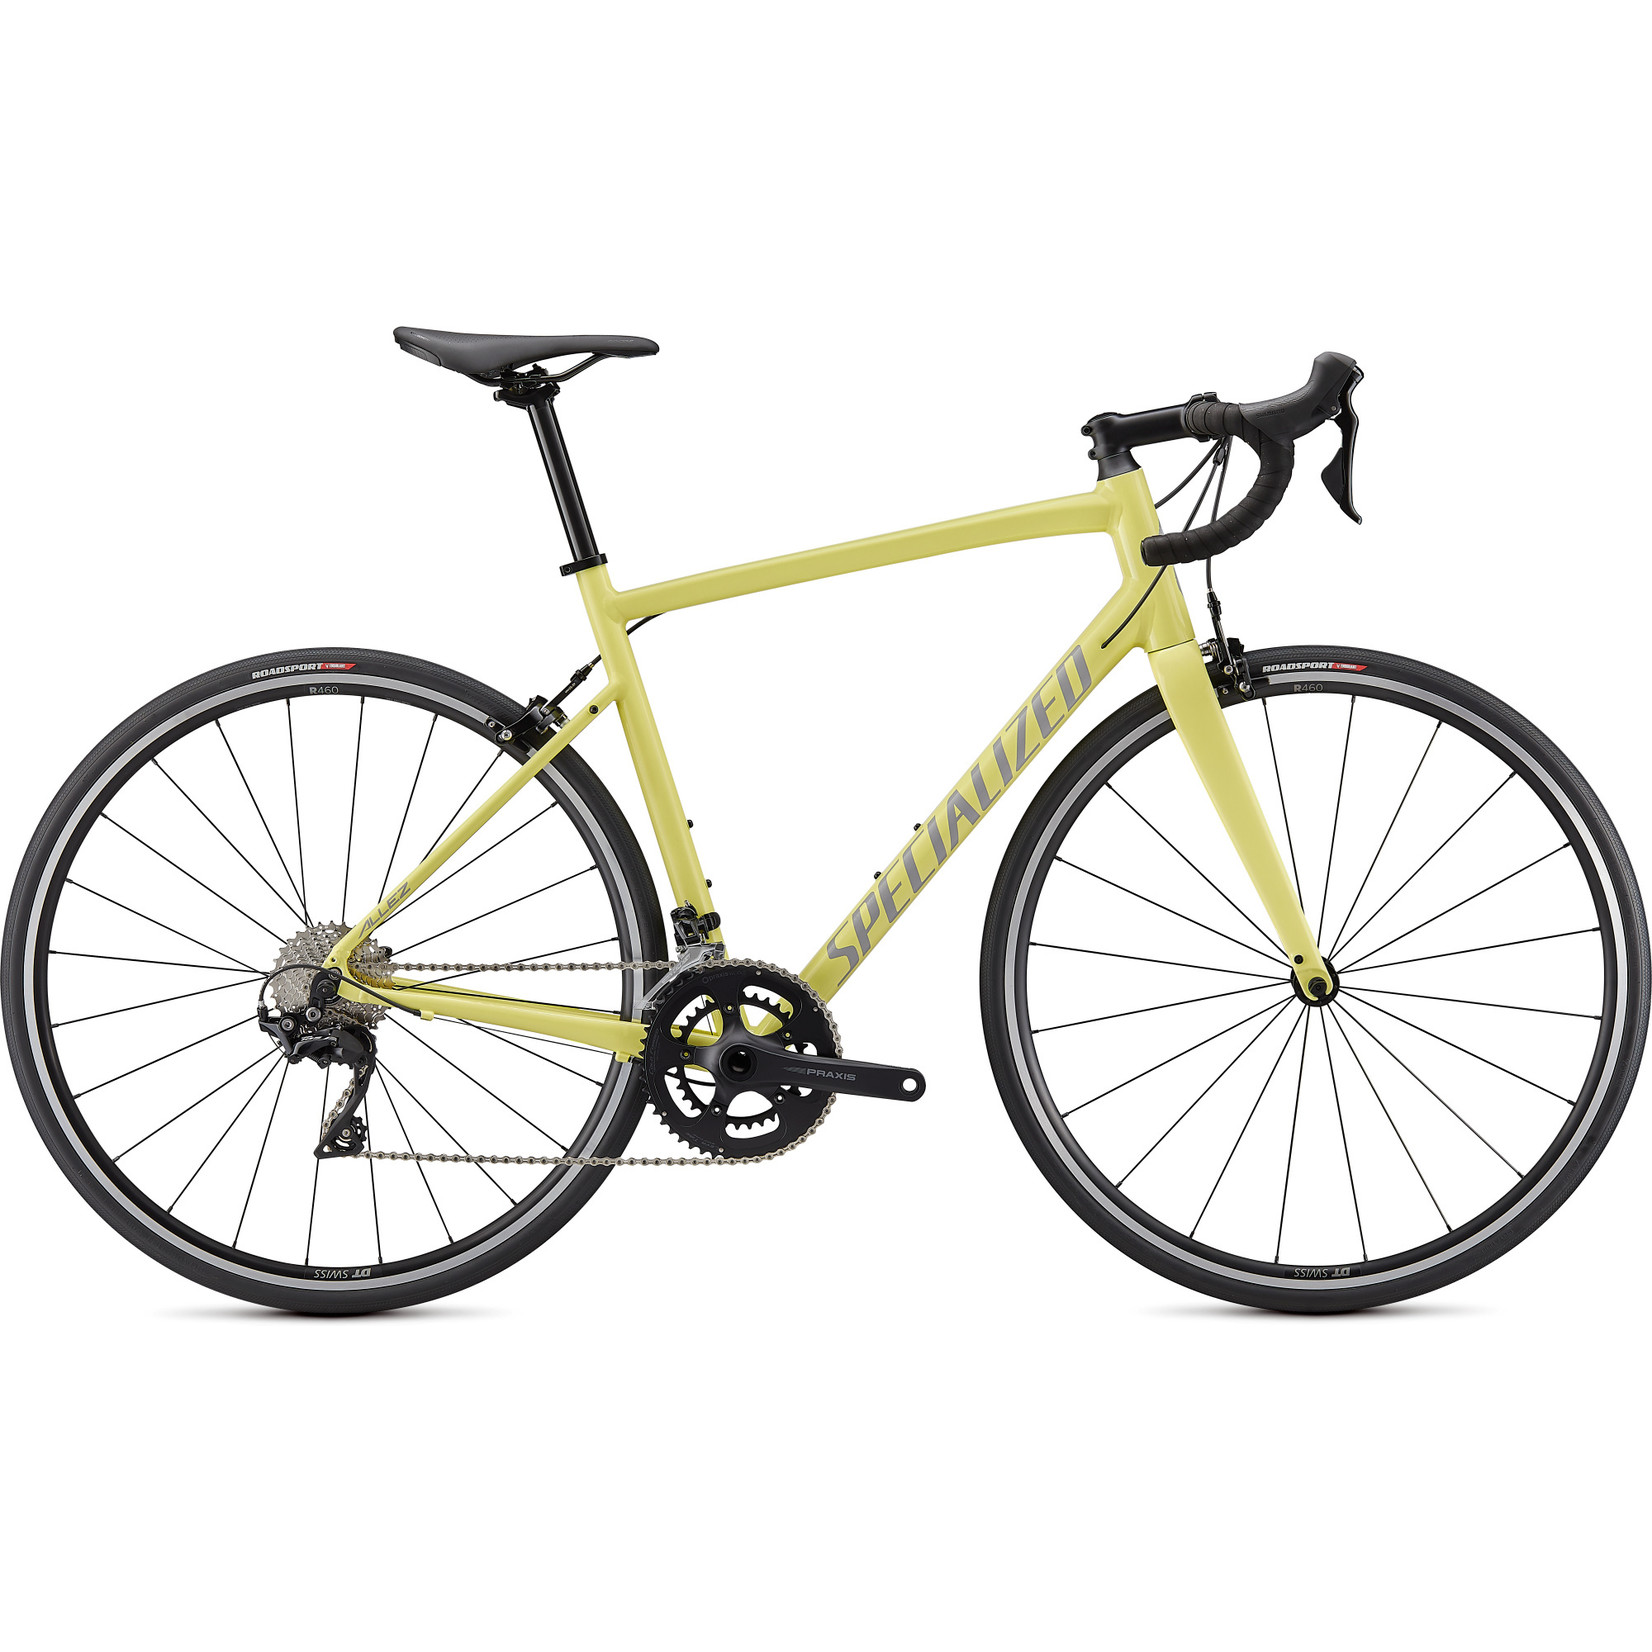 Specialized Allez E5 ELITE - Ice Yellow/Dove Grey 54